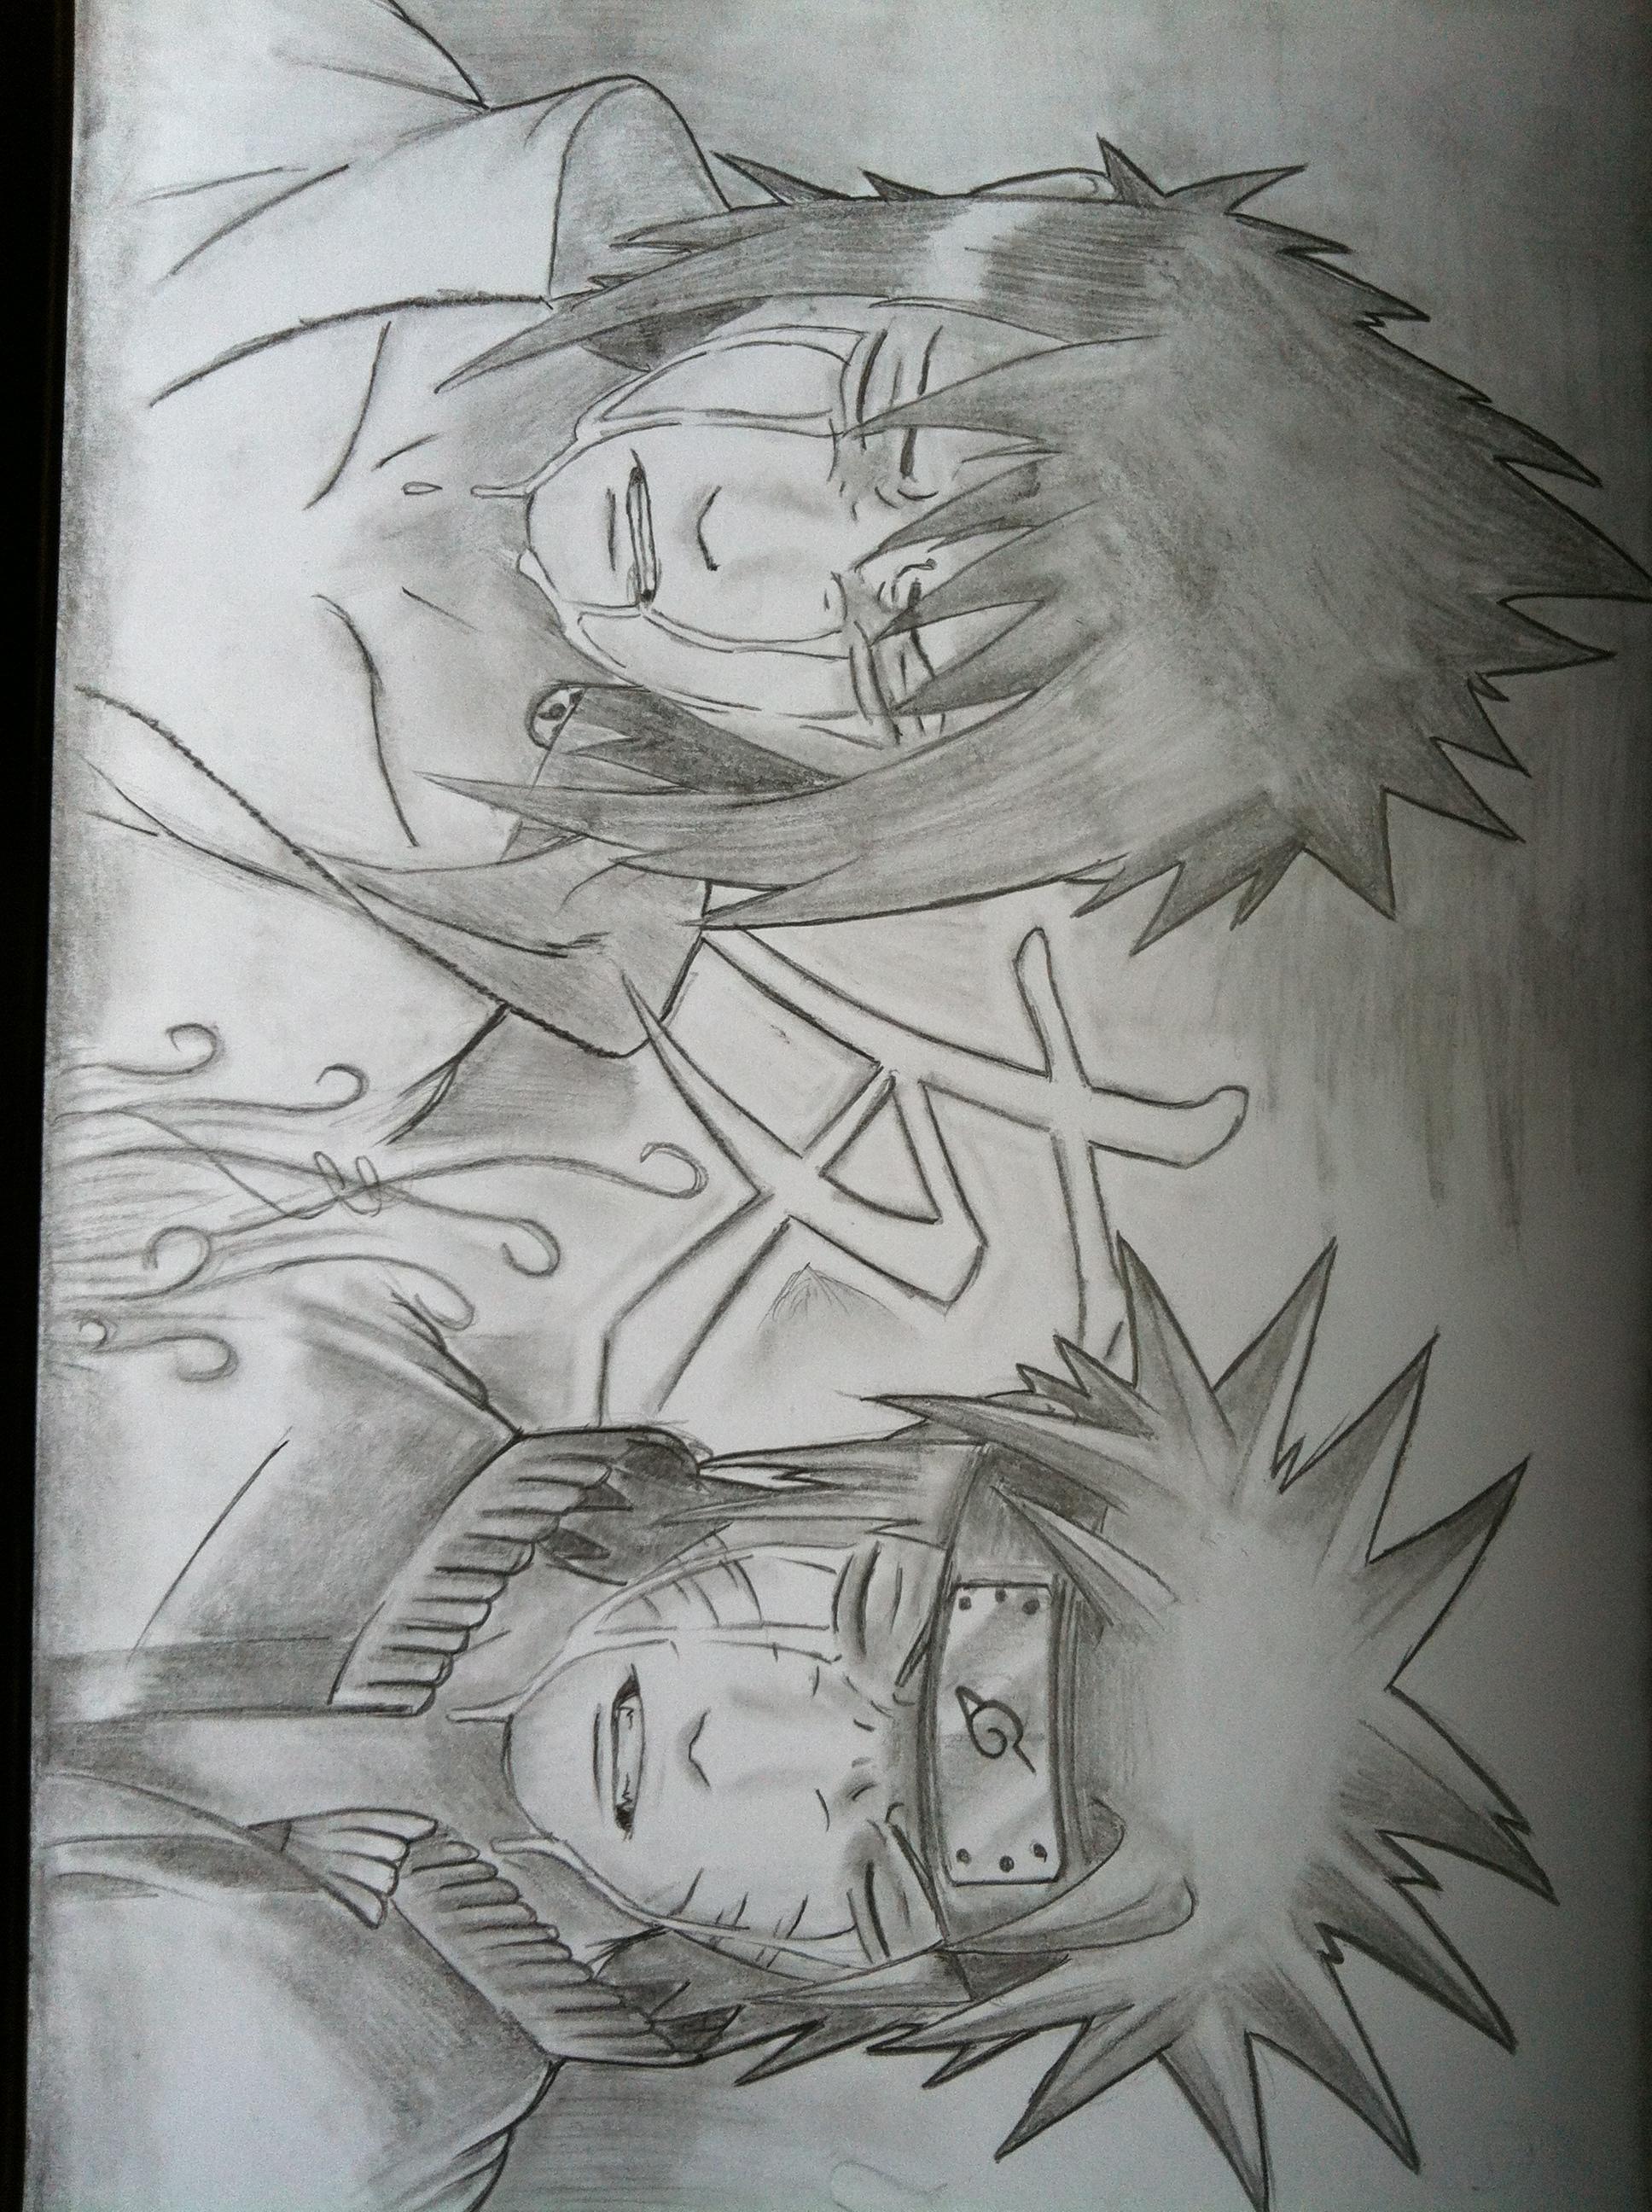 naruto and sasuke sadness by GraficFX on DeviantArt Naruto And Sasuke Sad